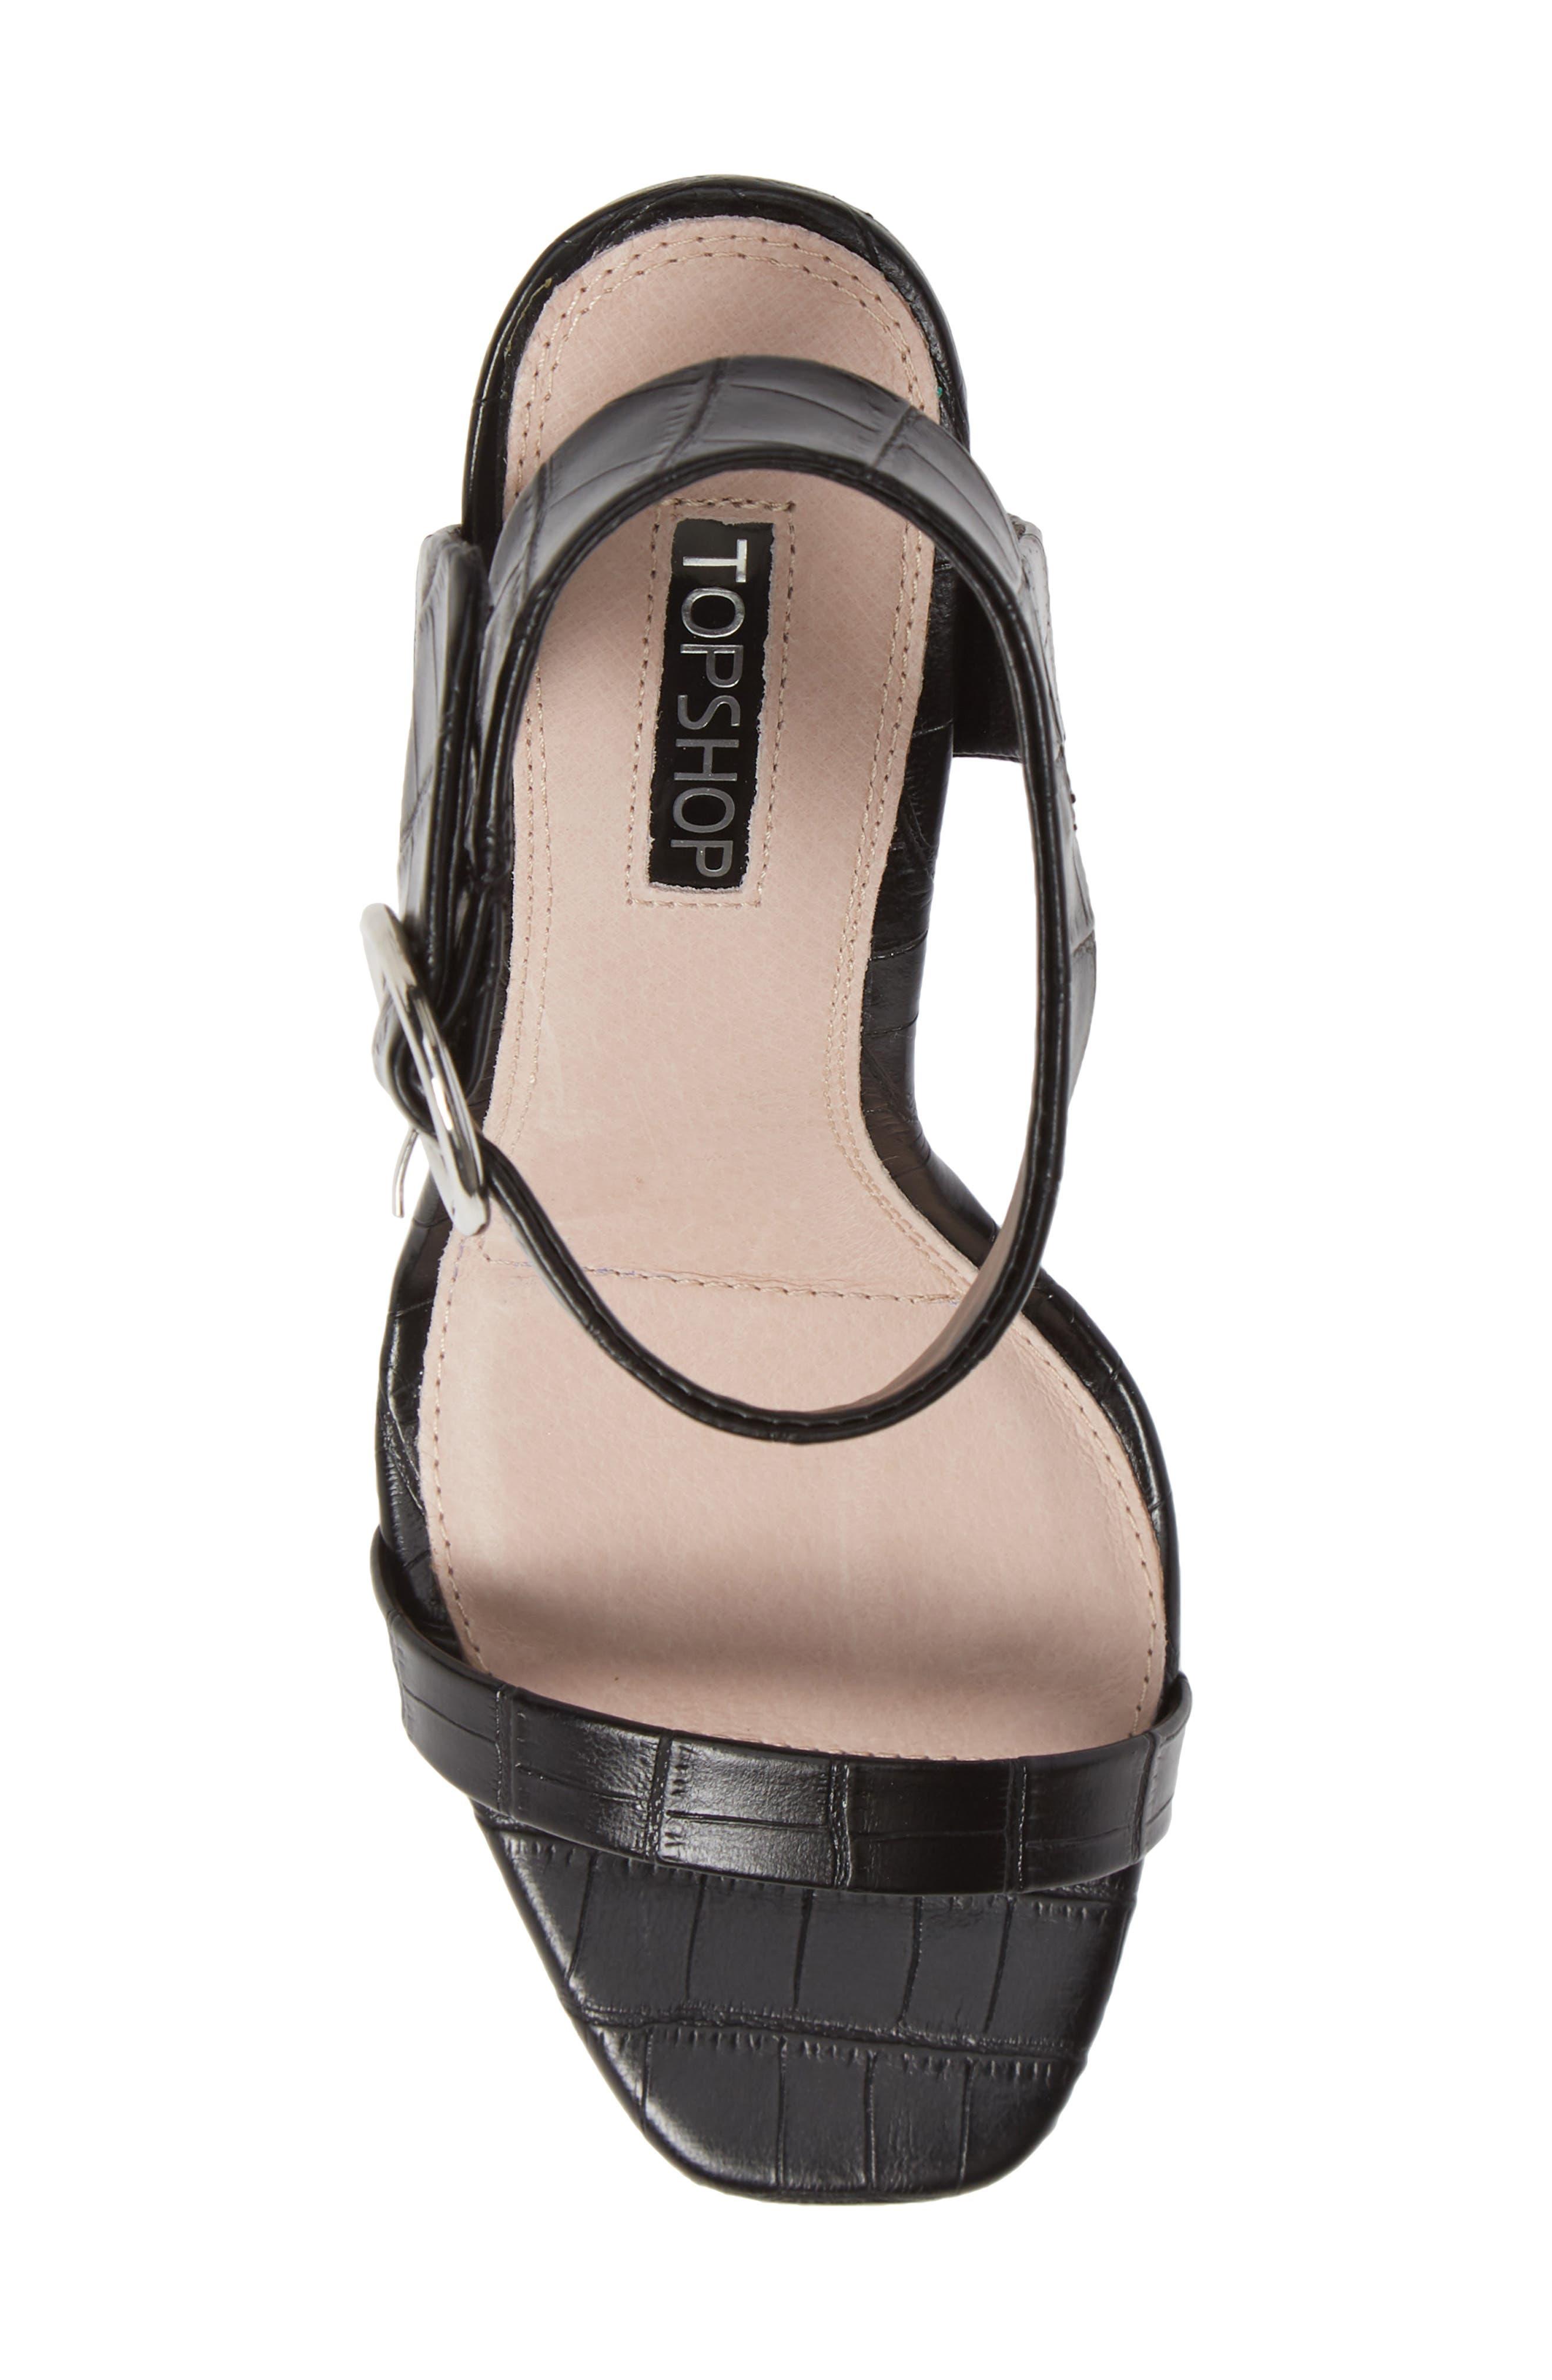 Ria Ankle Cuff Sandal,                             Alternate thumbnail 5, color,                             BLACK